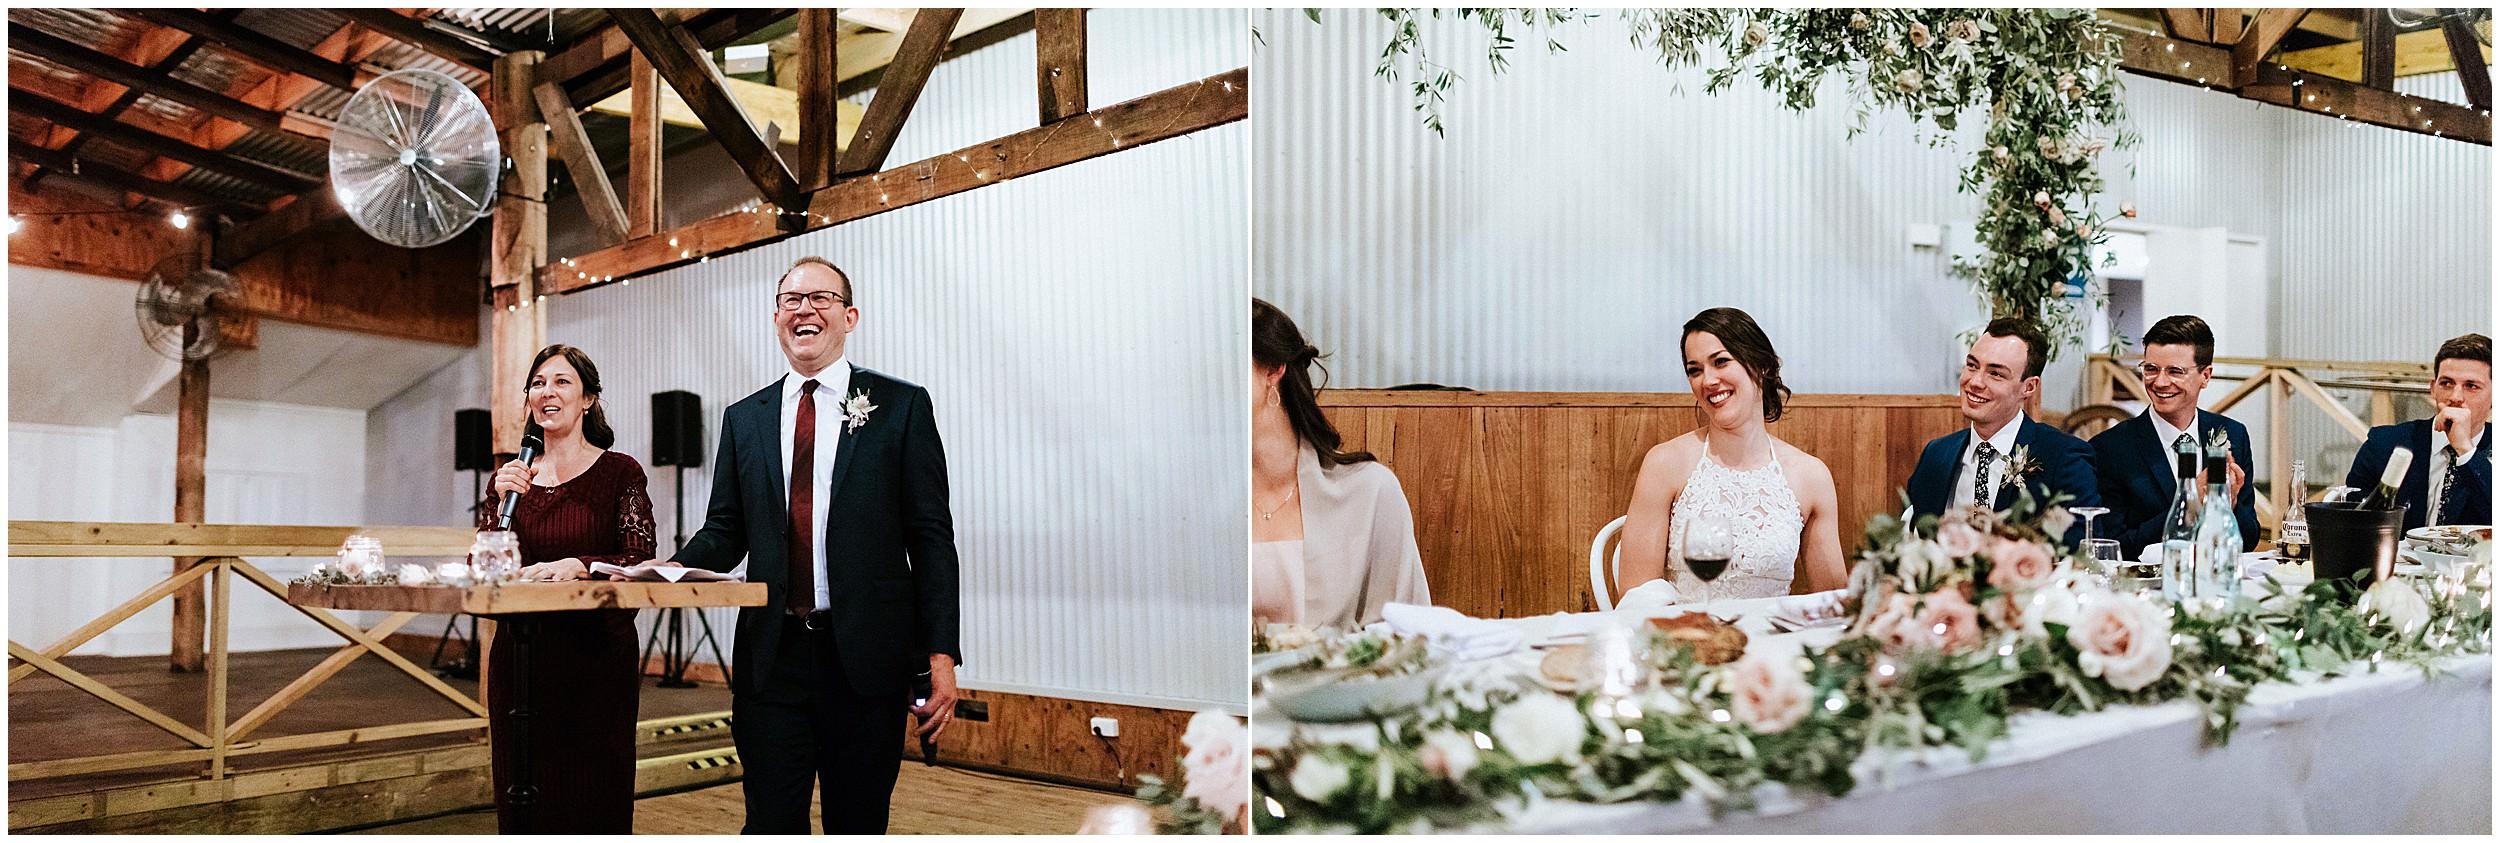 wedding_the_woolshed_steph_zac_0071.jpg